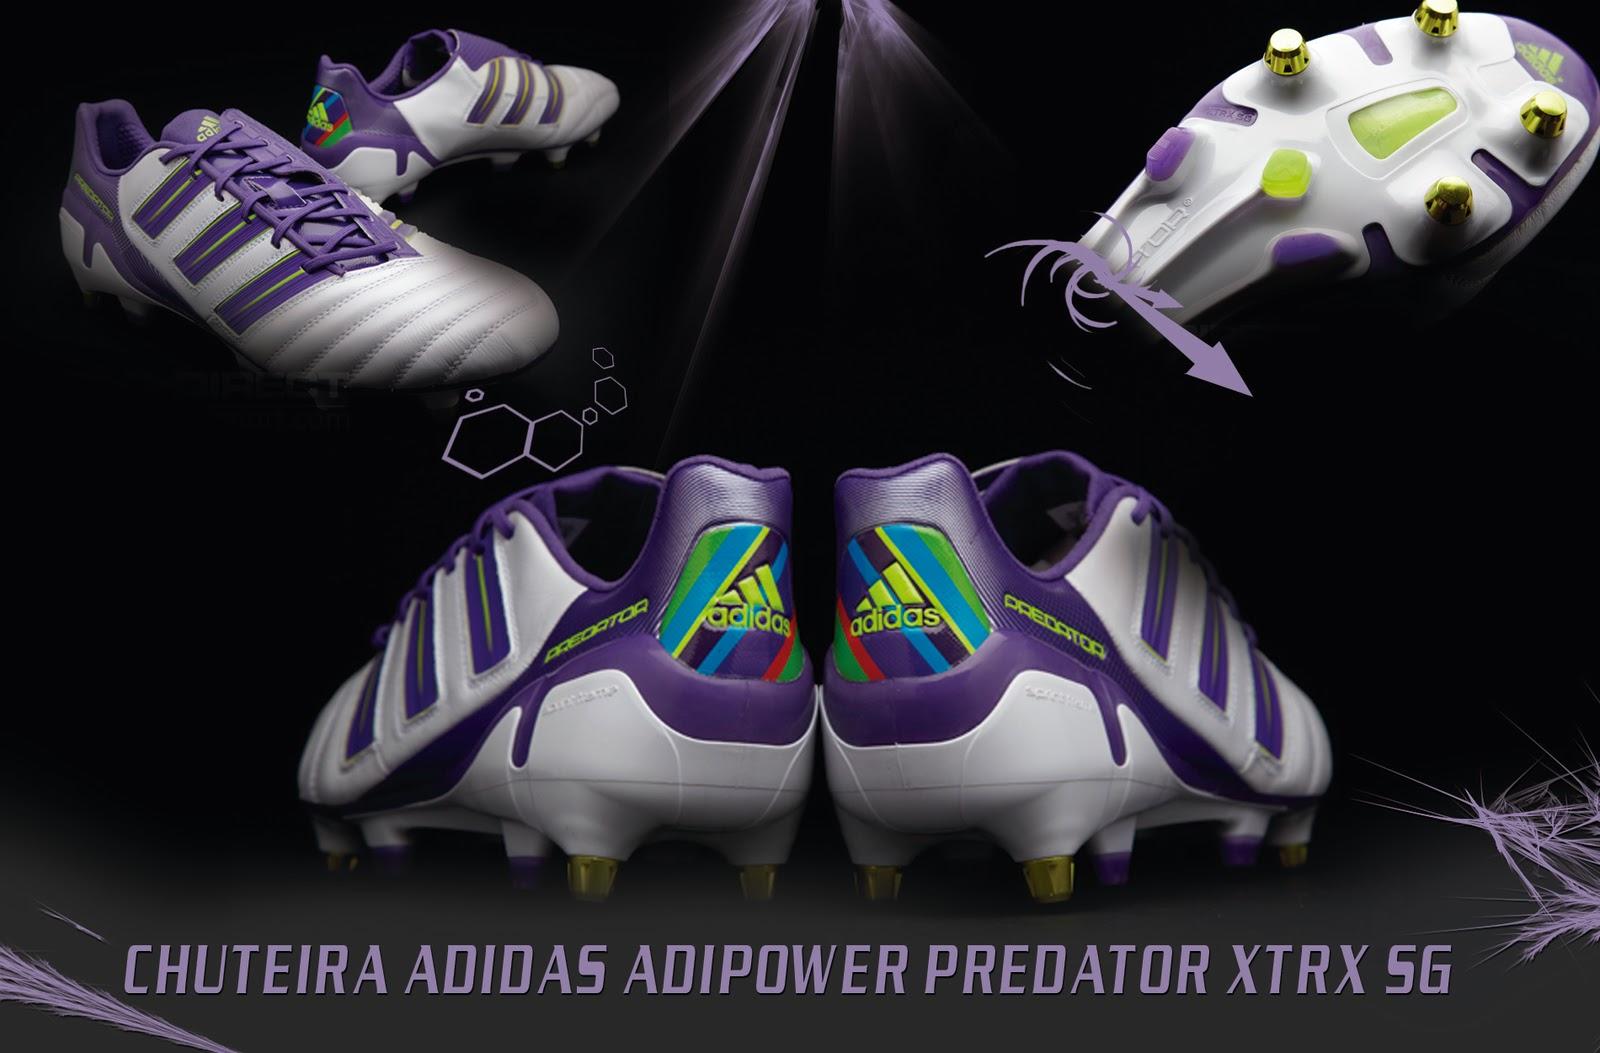 Modelos de Chuteiras Adidas 2013 – Fotos, Modelos, Preços, Comprar Loja Virtual